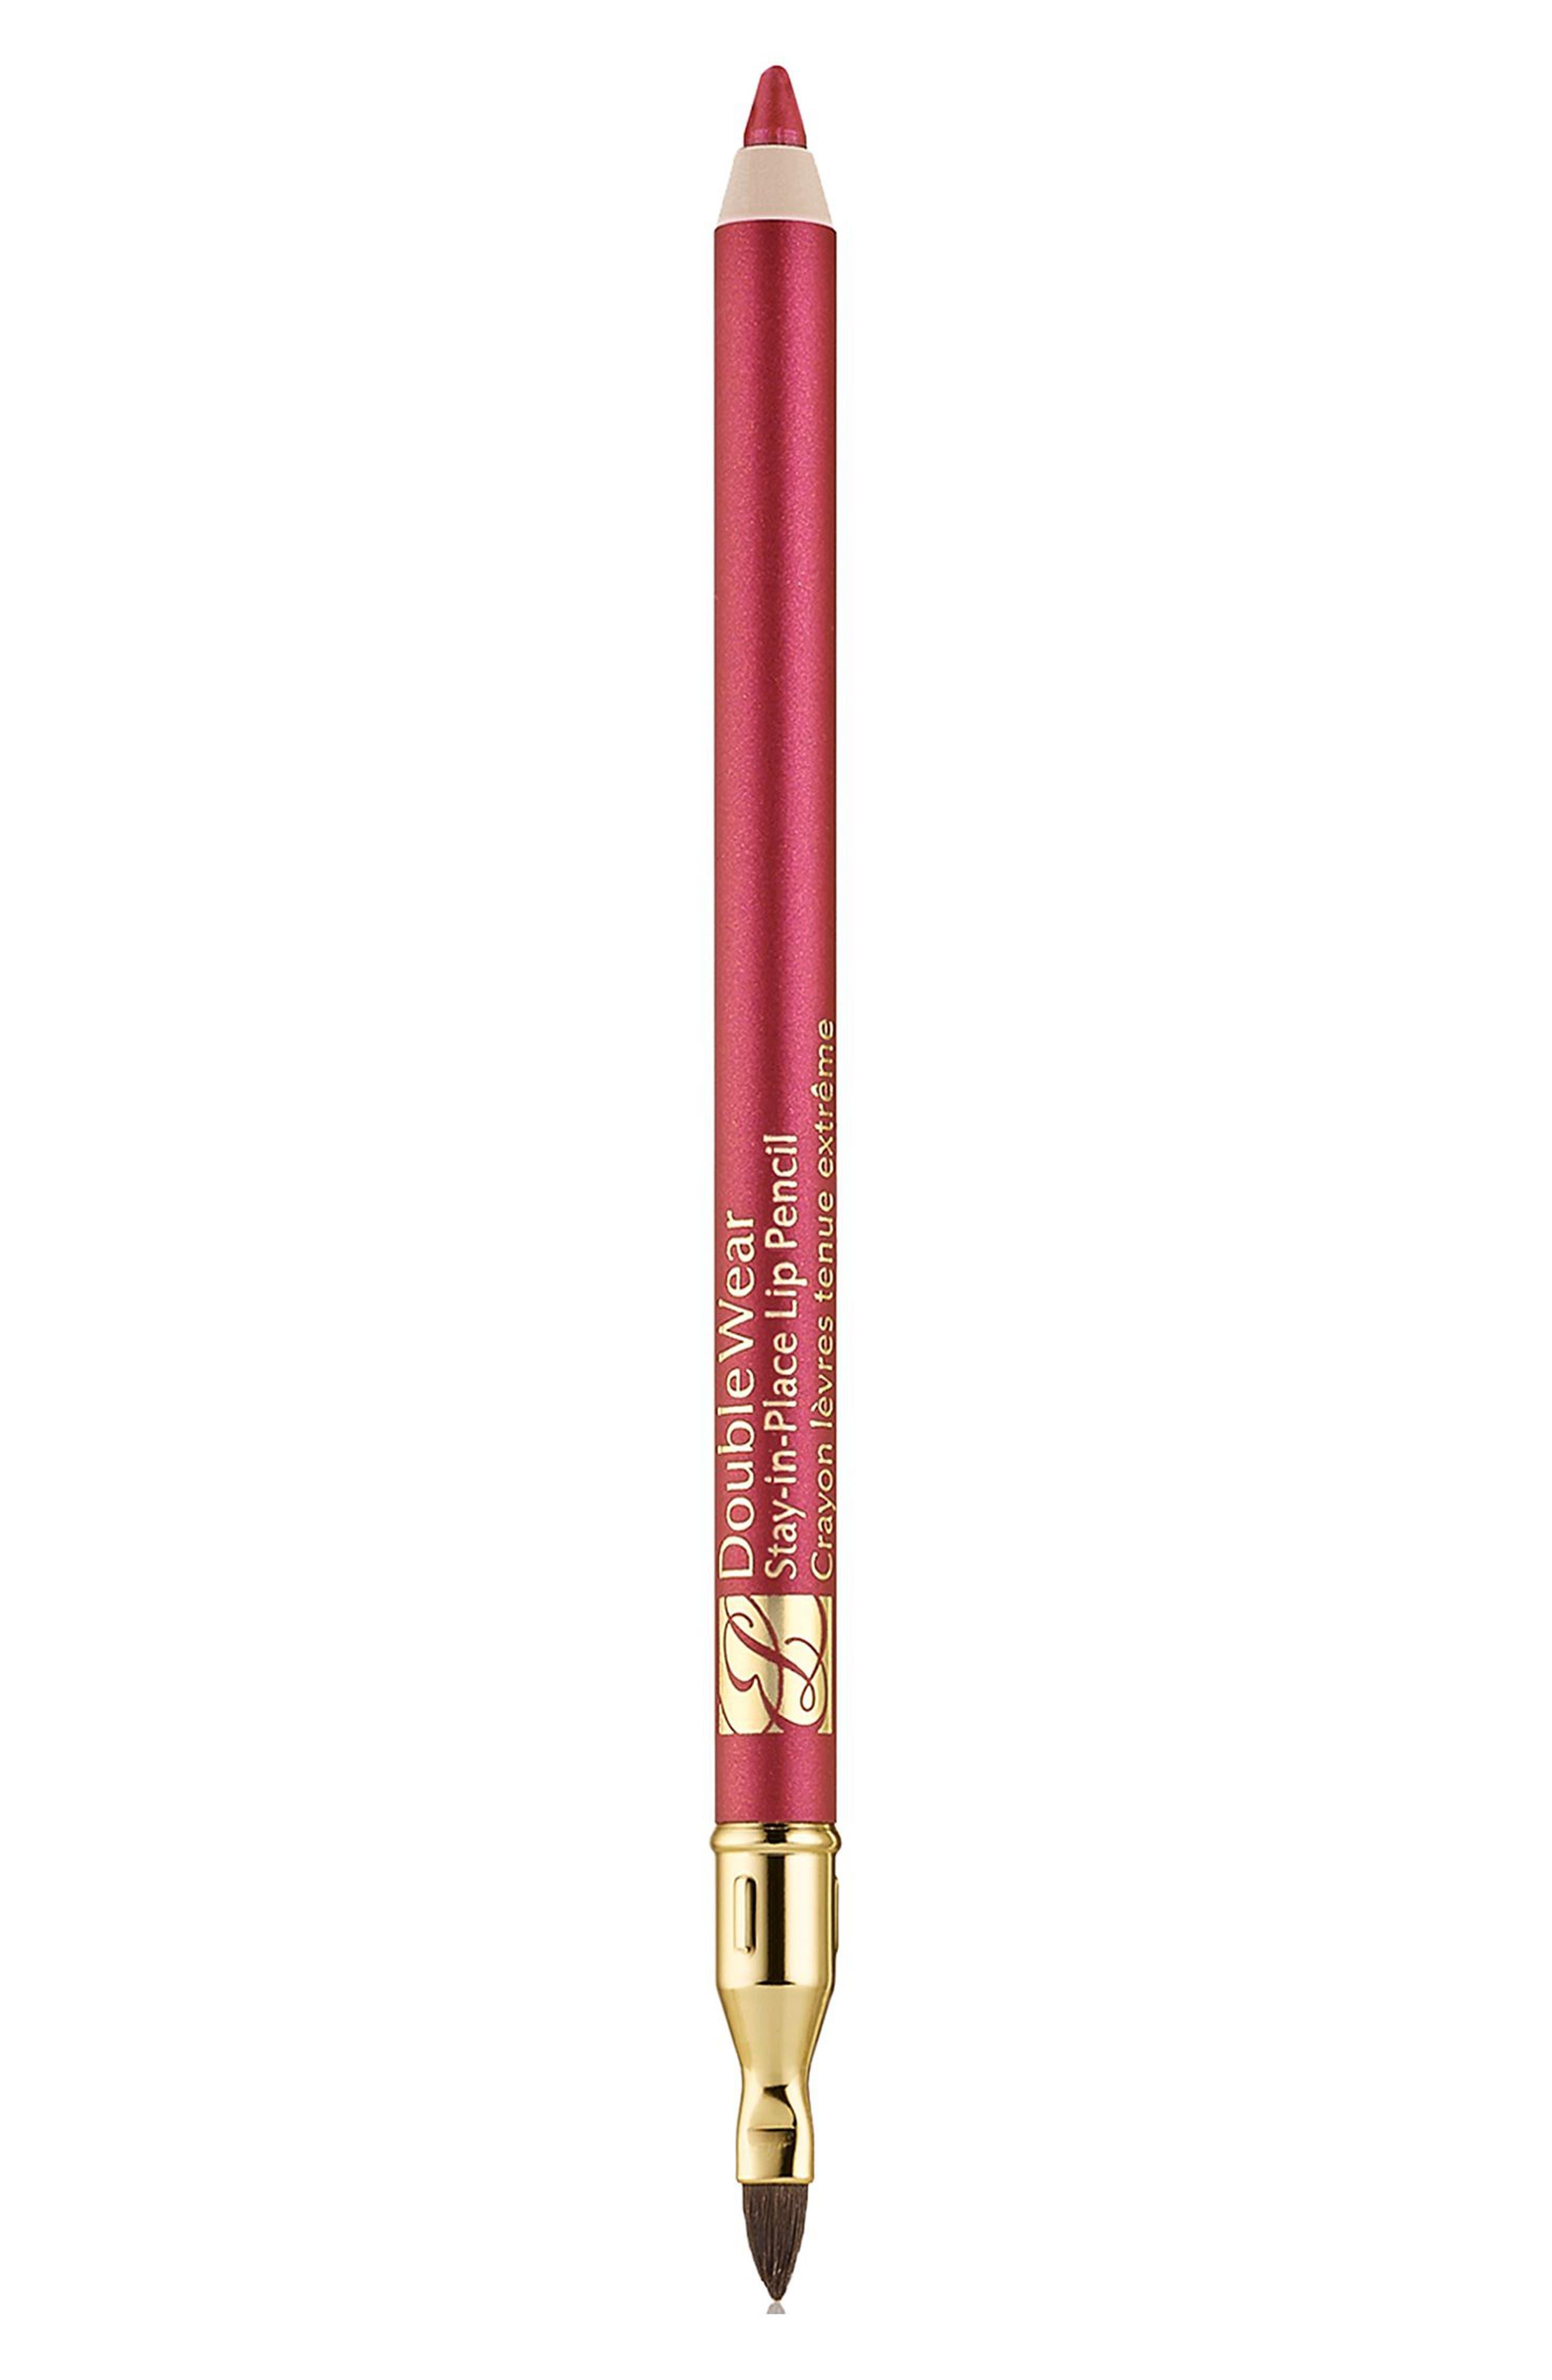 Estee Lauder Double Wear Stay-In-Place Lip Pencil - Apple Cordial